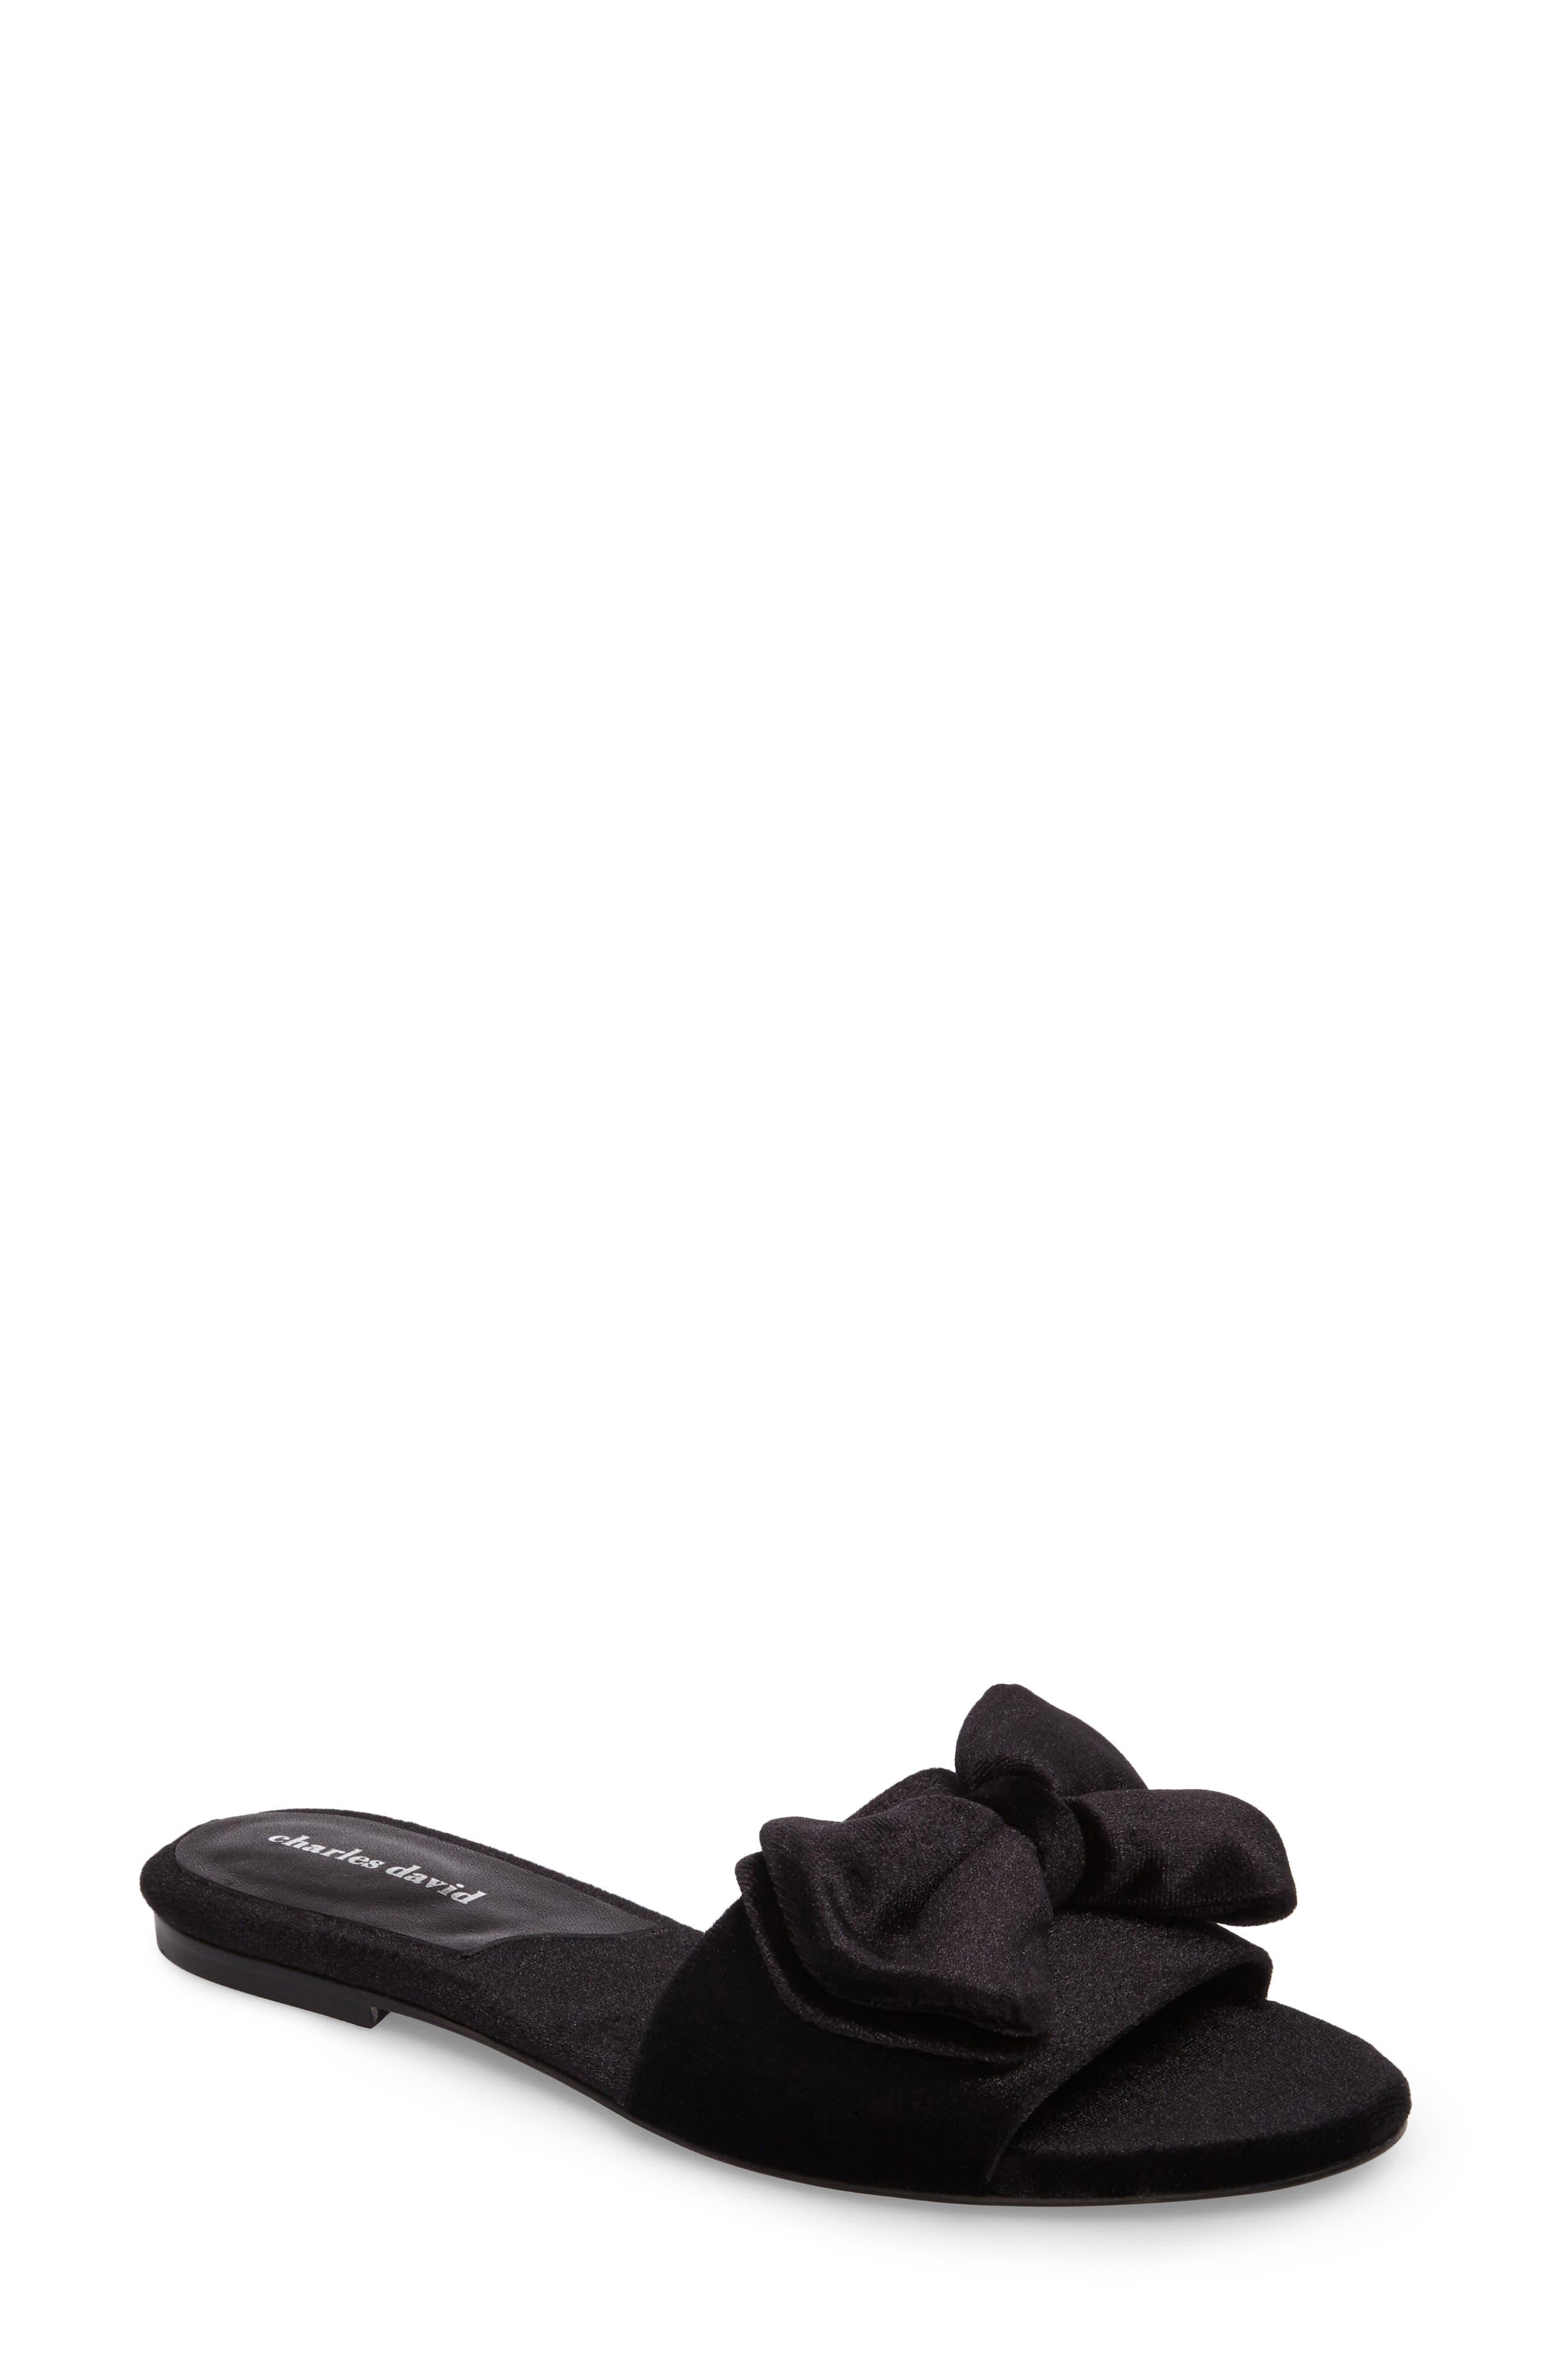 Bow Slide Sandal,                             Main thumbnail 1, color,